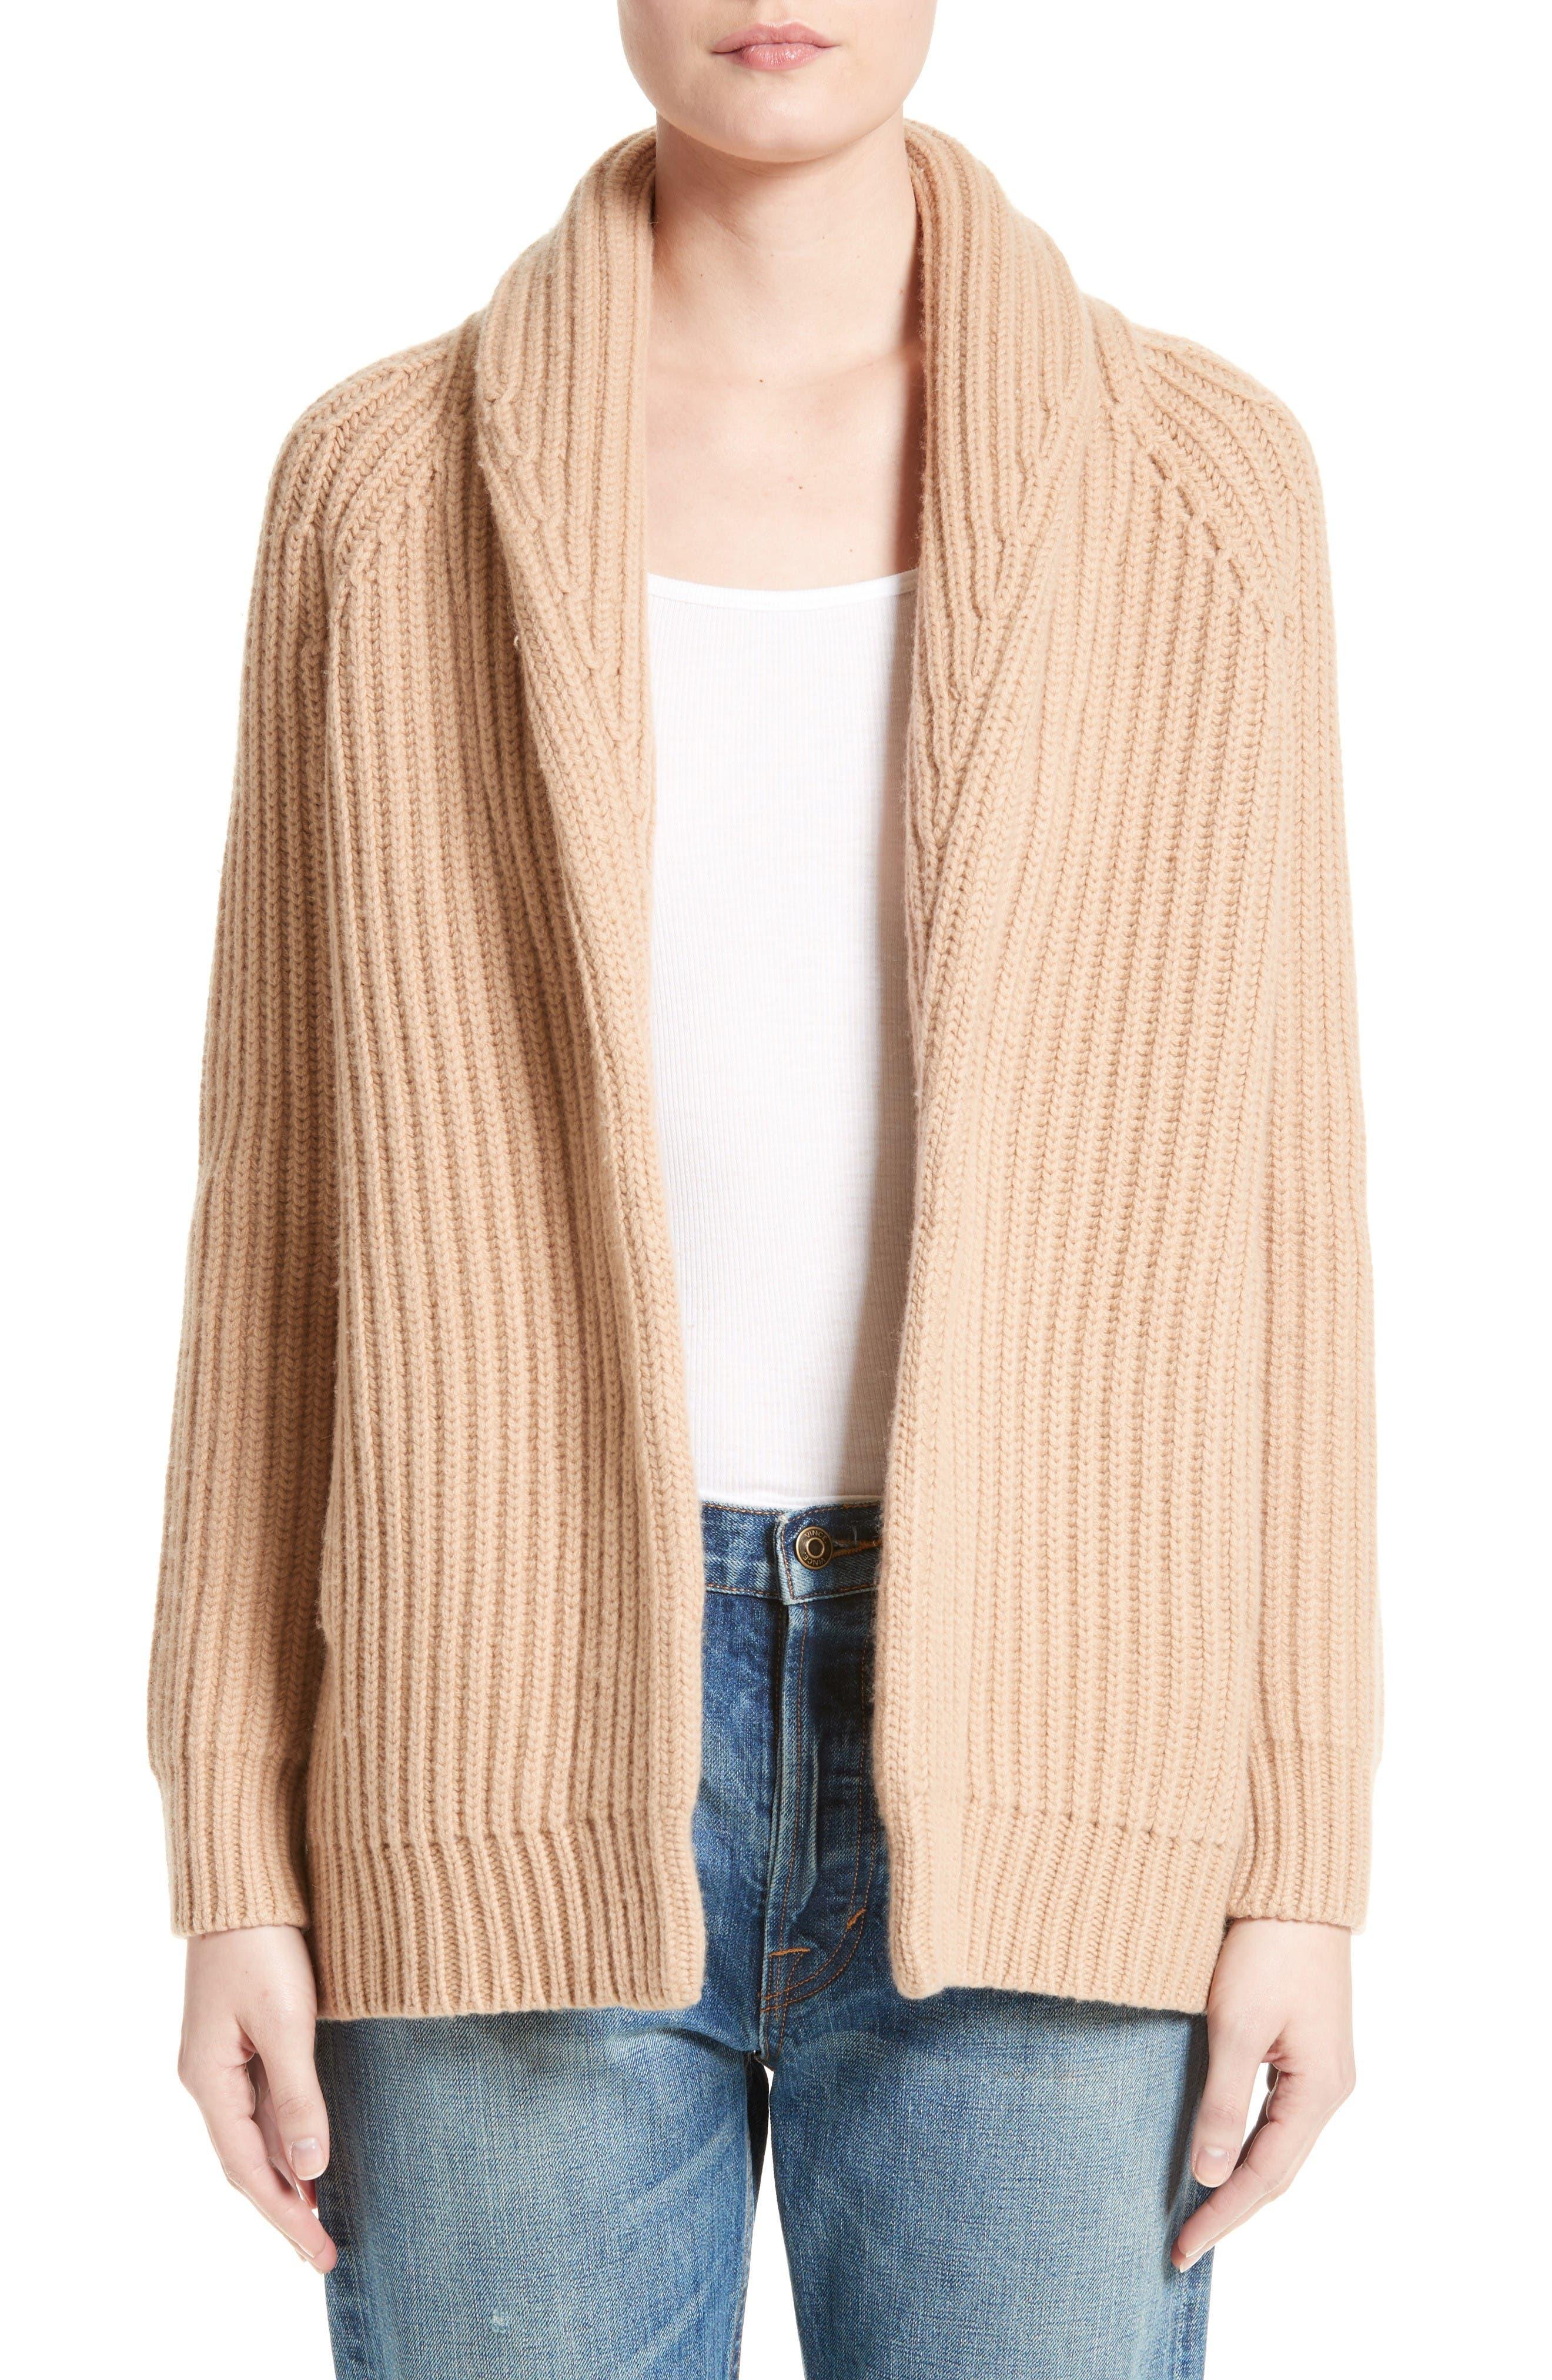 Alternate Image 1 Selected - Vince Wool & Cashmere Knit Car Coat